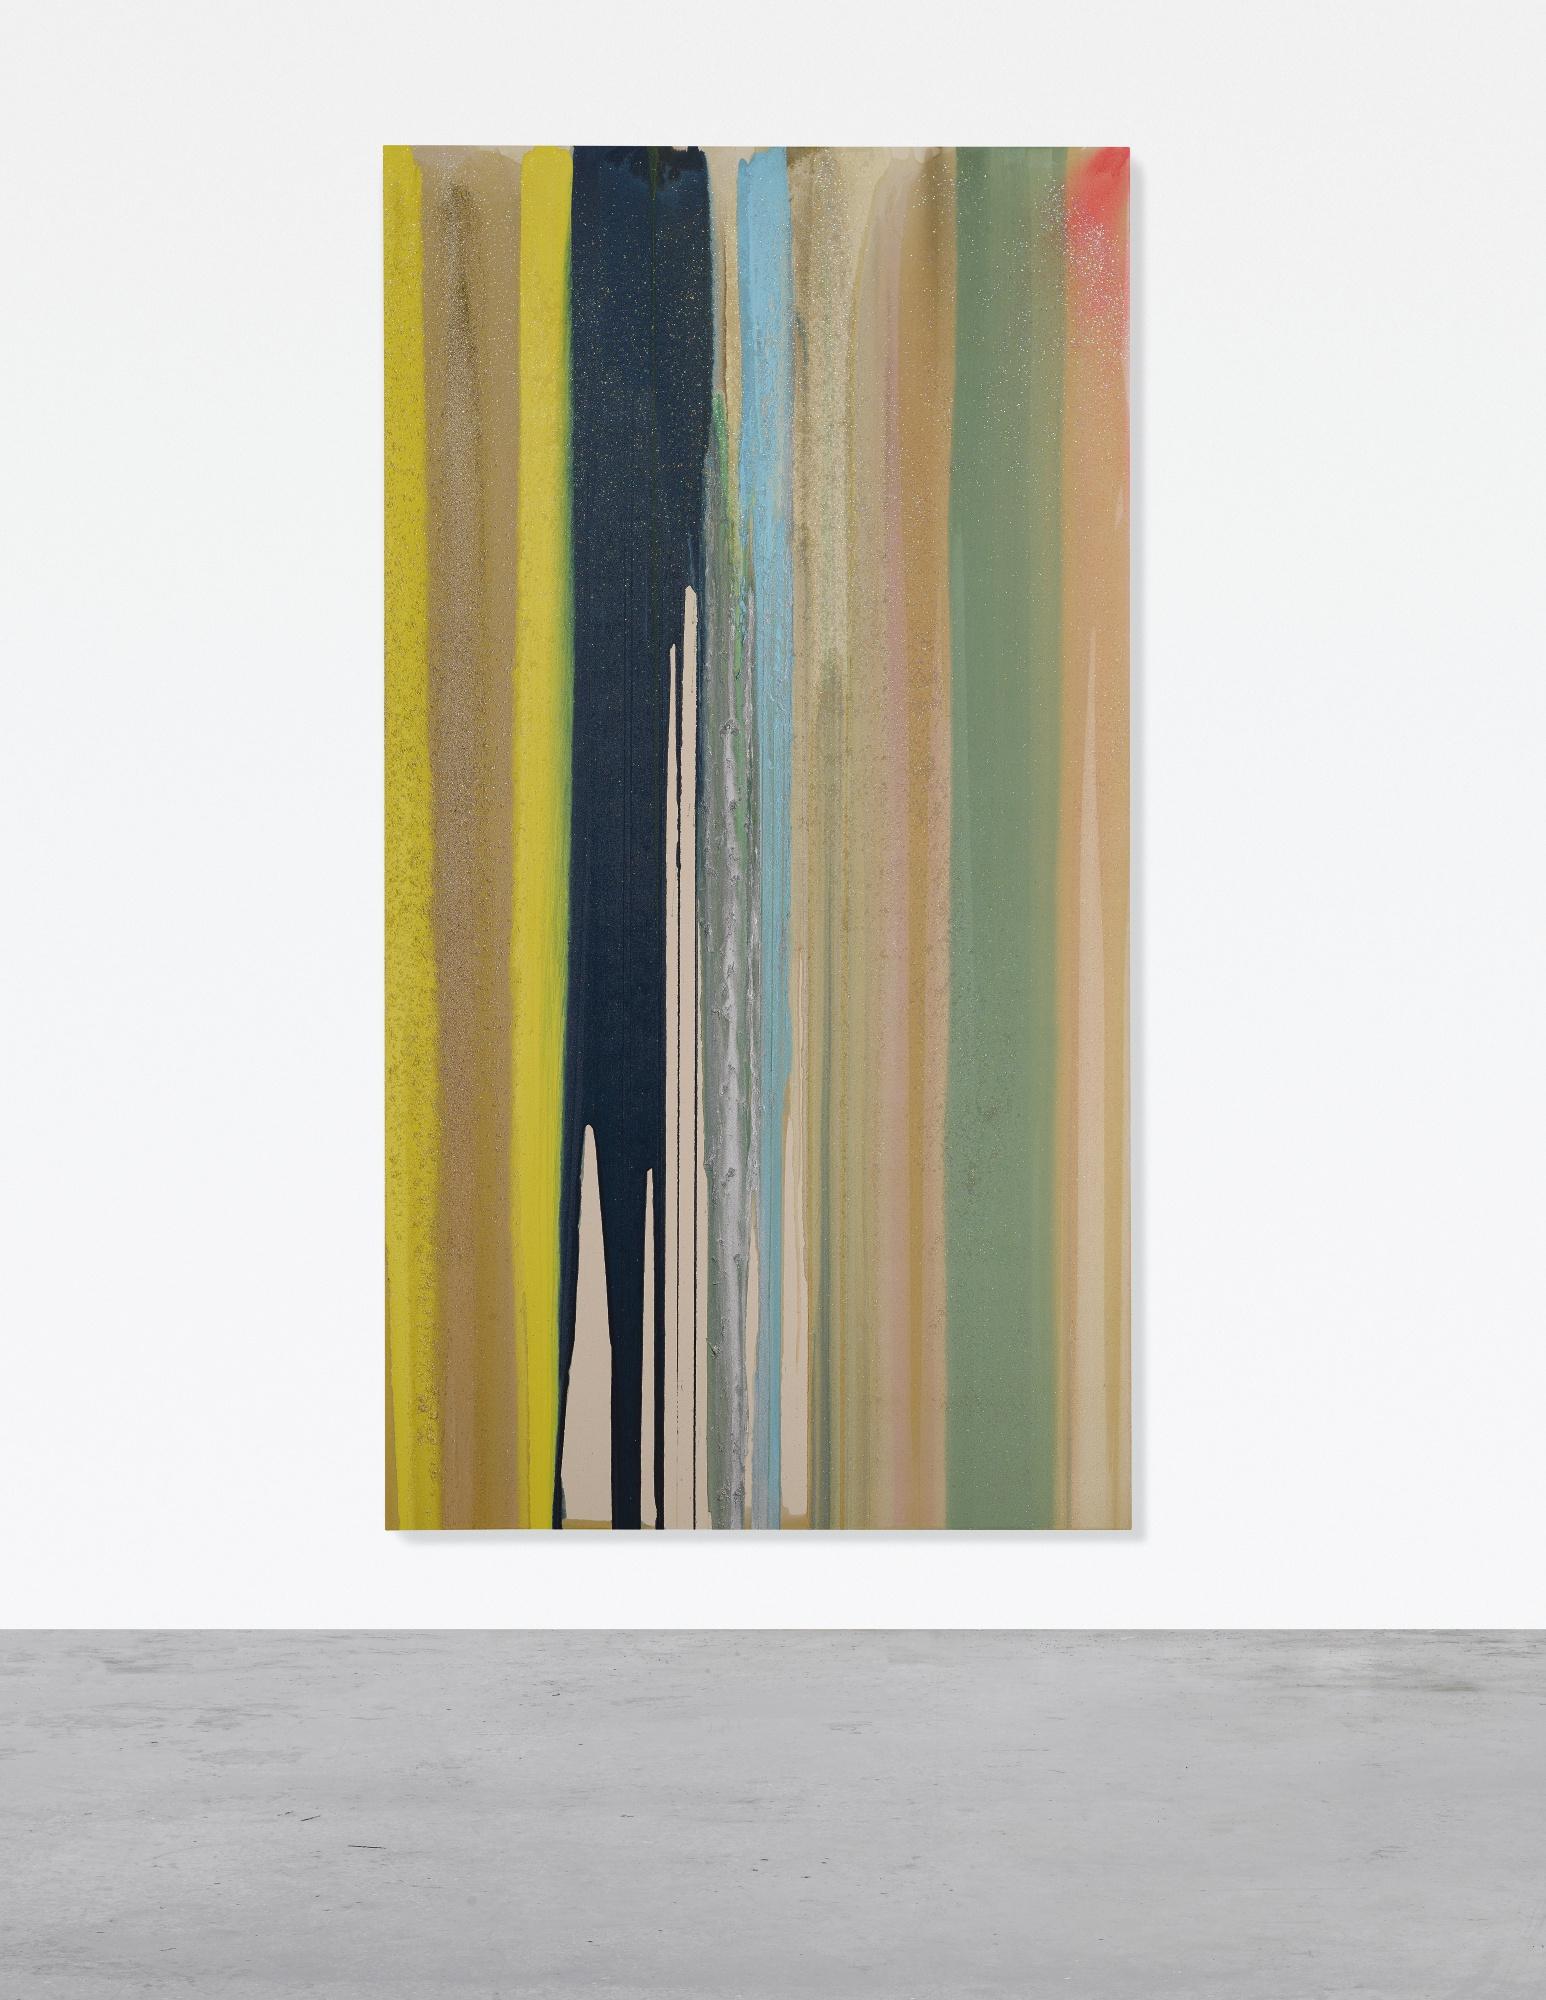 John Armleder-Aster Amellus-2006